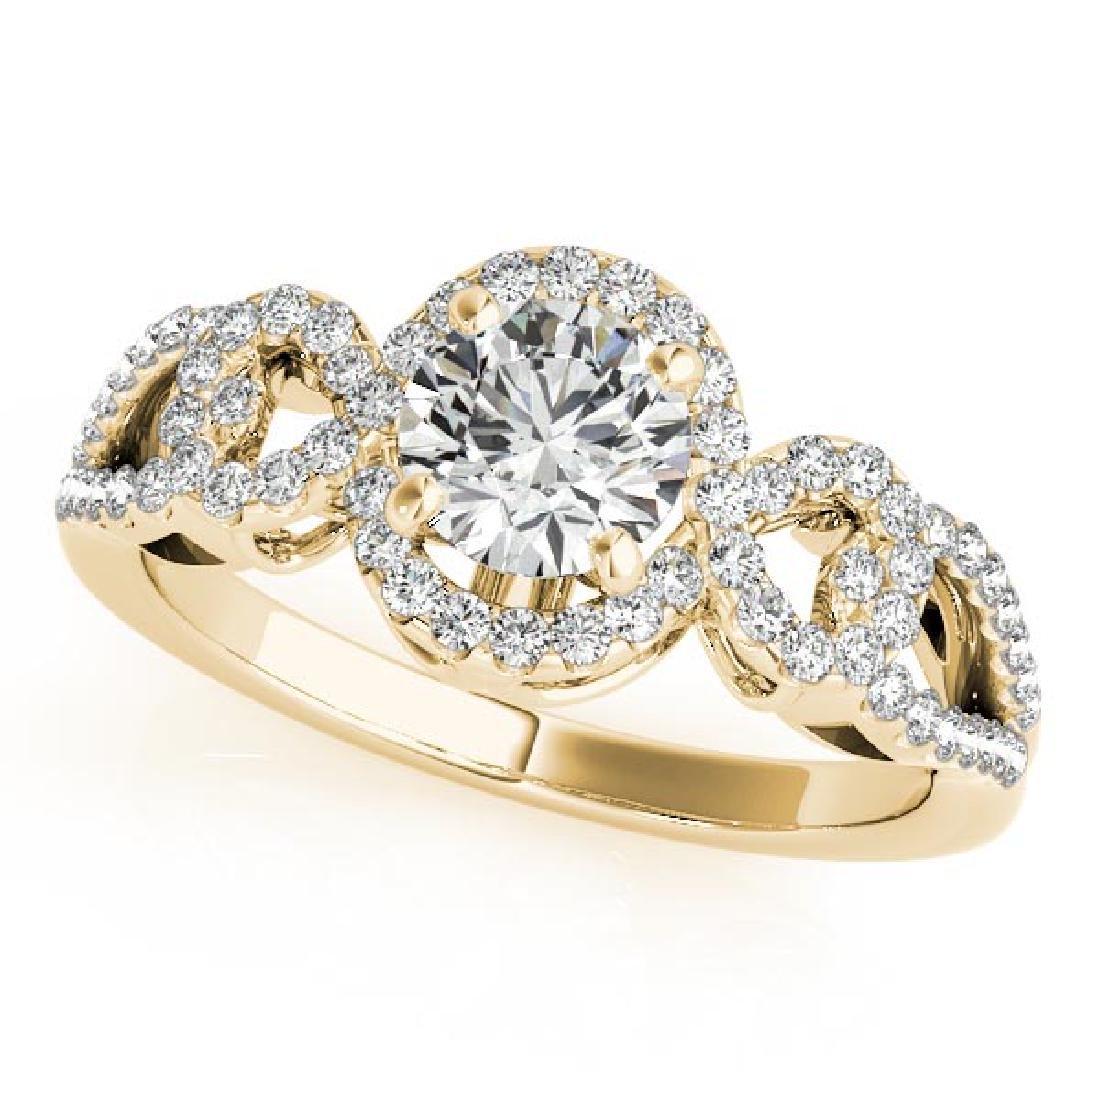 CERTIFIED 18K YELLOW GOLD 1.34 CT G-H/VS-SI1 DIAMOND HA